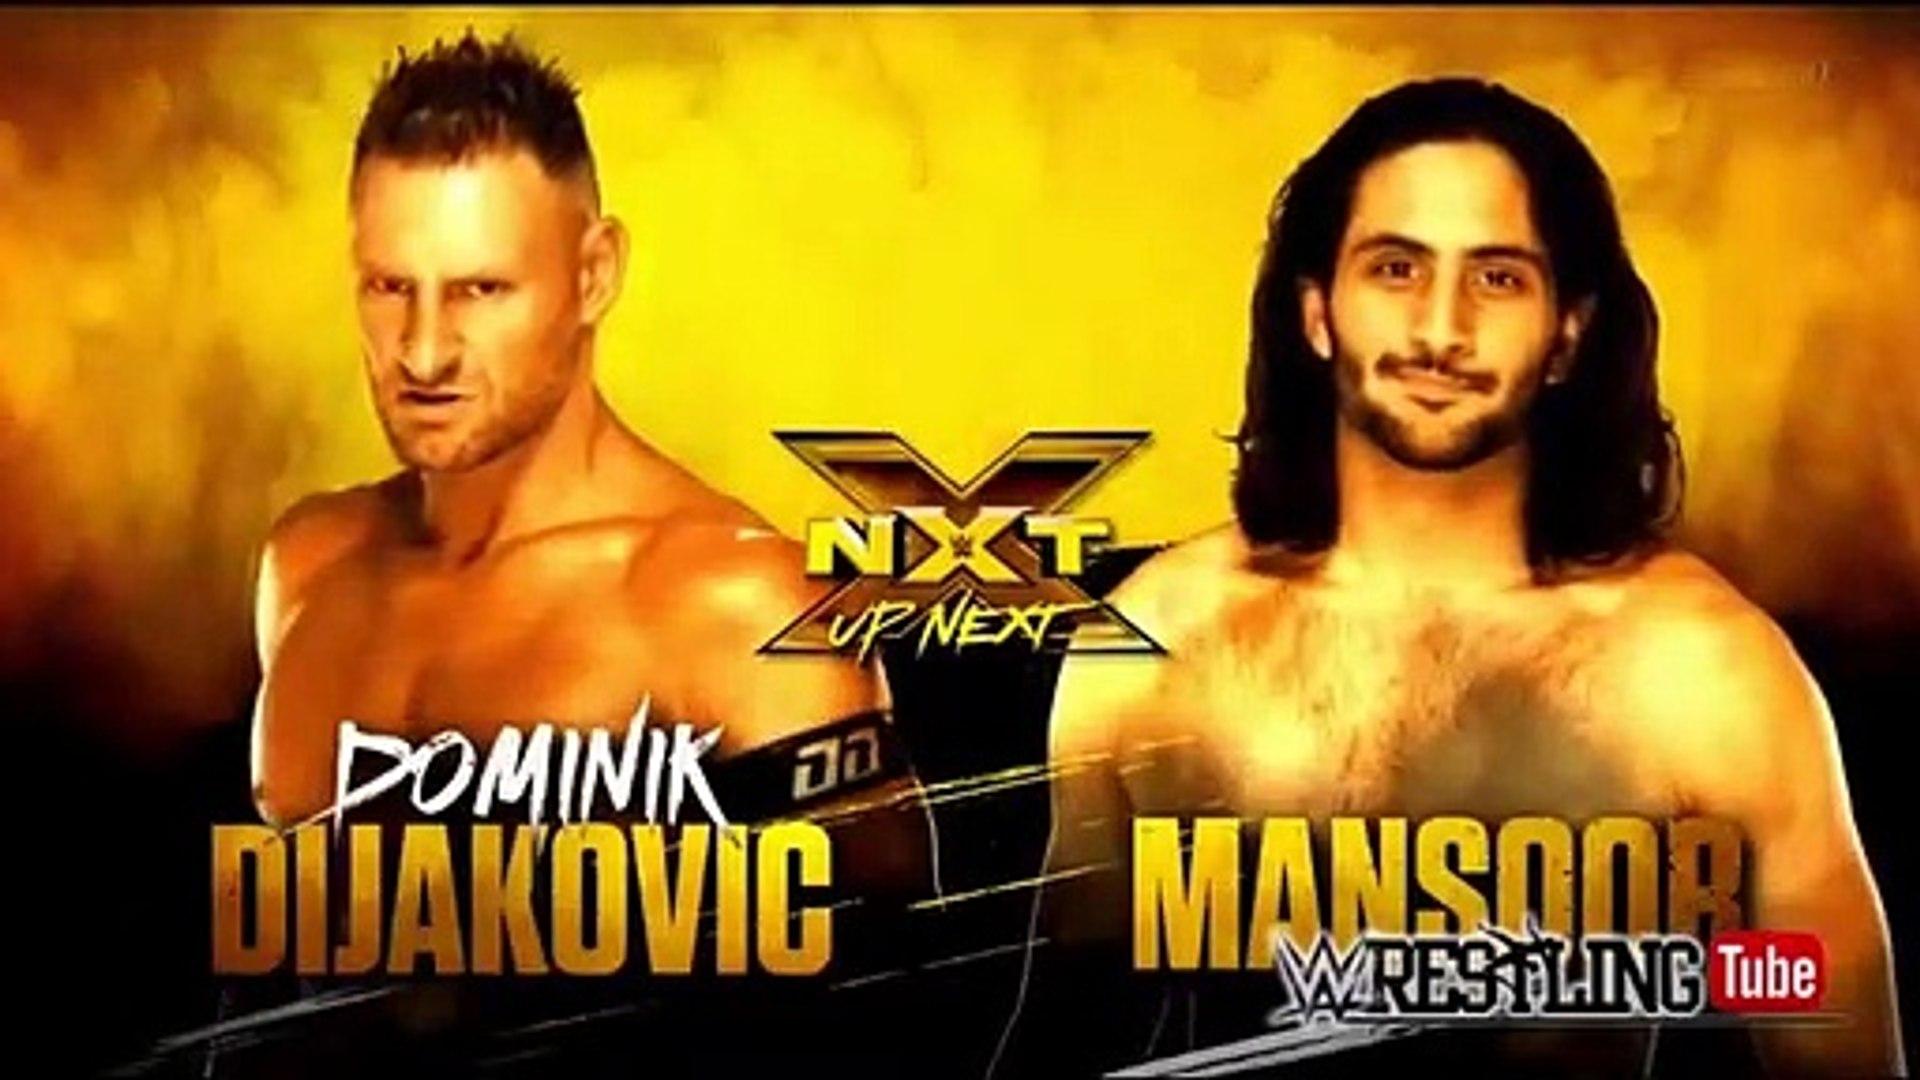 WWE NXT 1 May 2019 Full-Show Highlights HD - WWE NXT 1 May 2019 Highlights HD